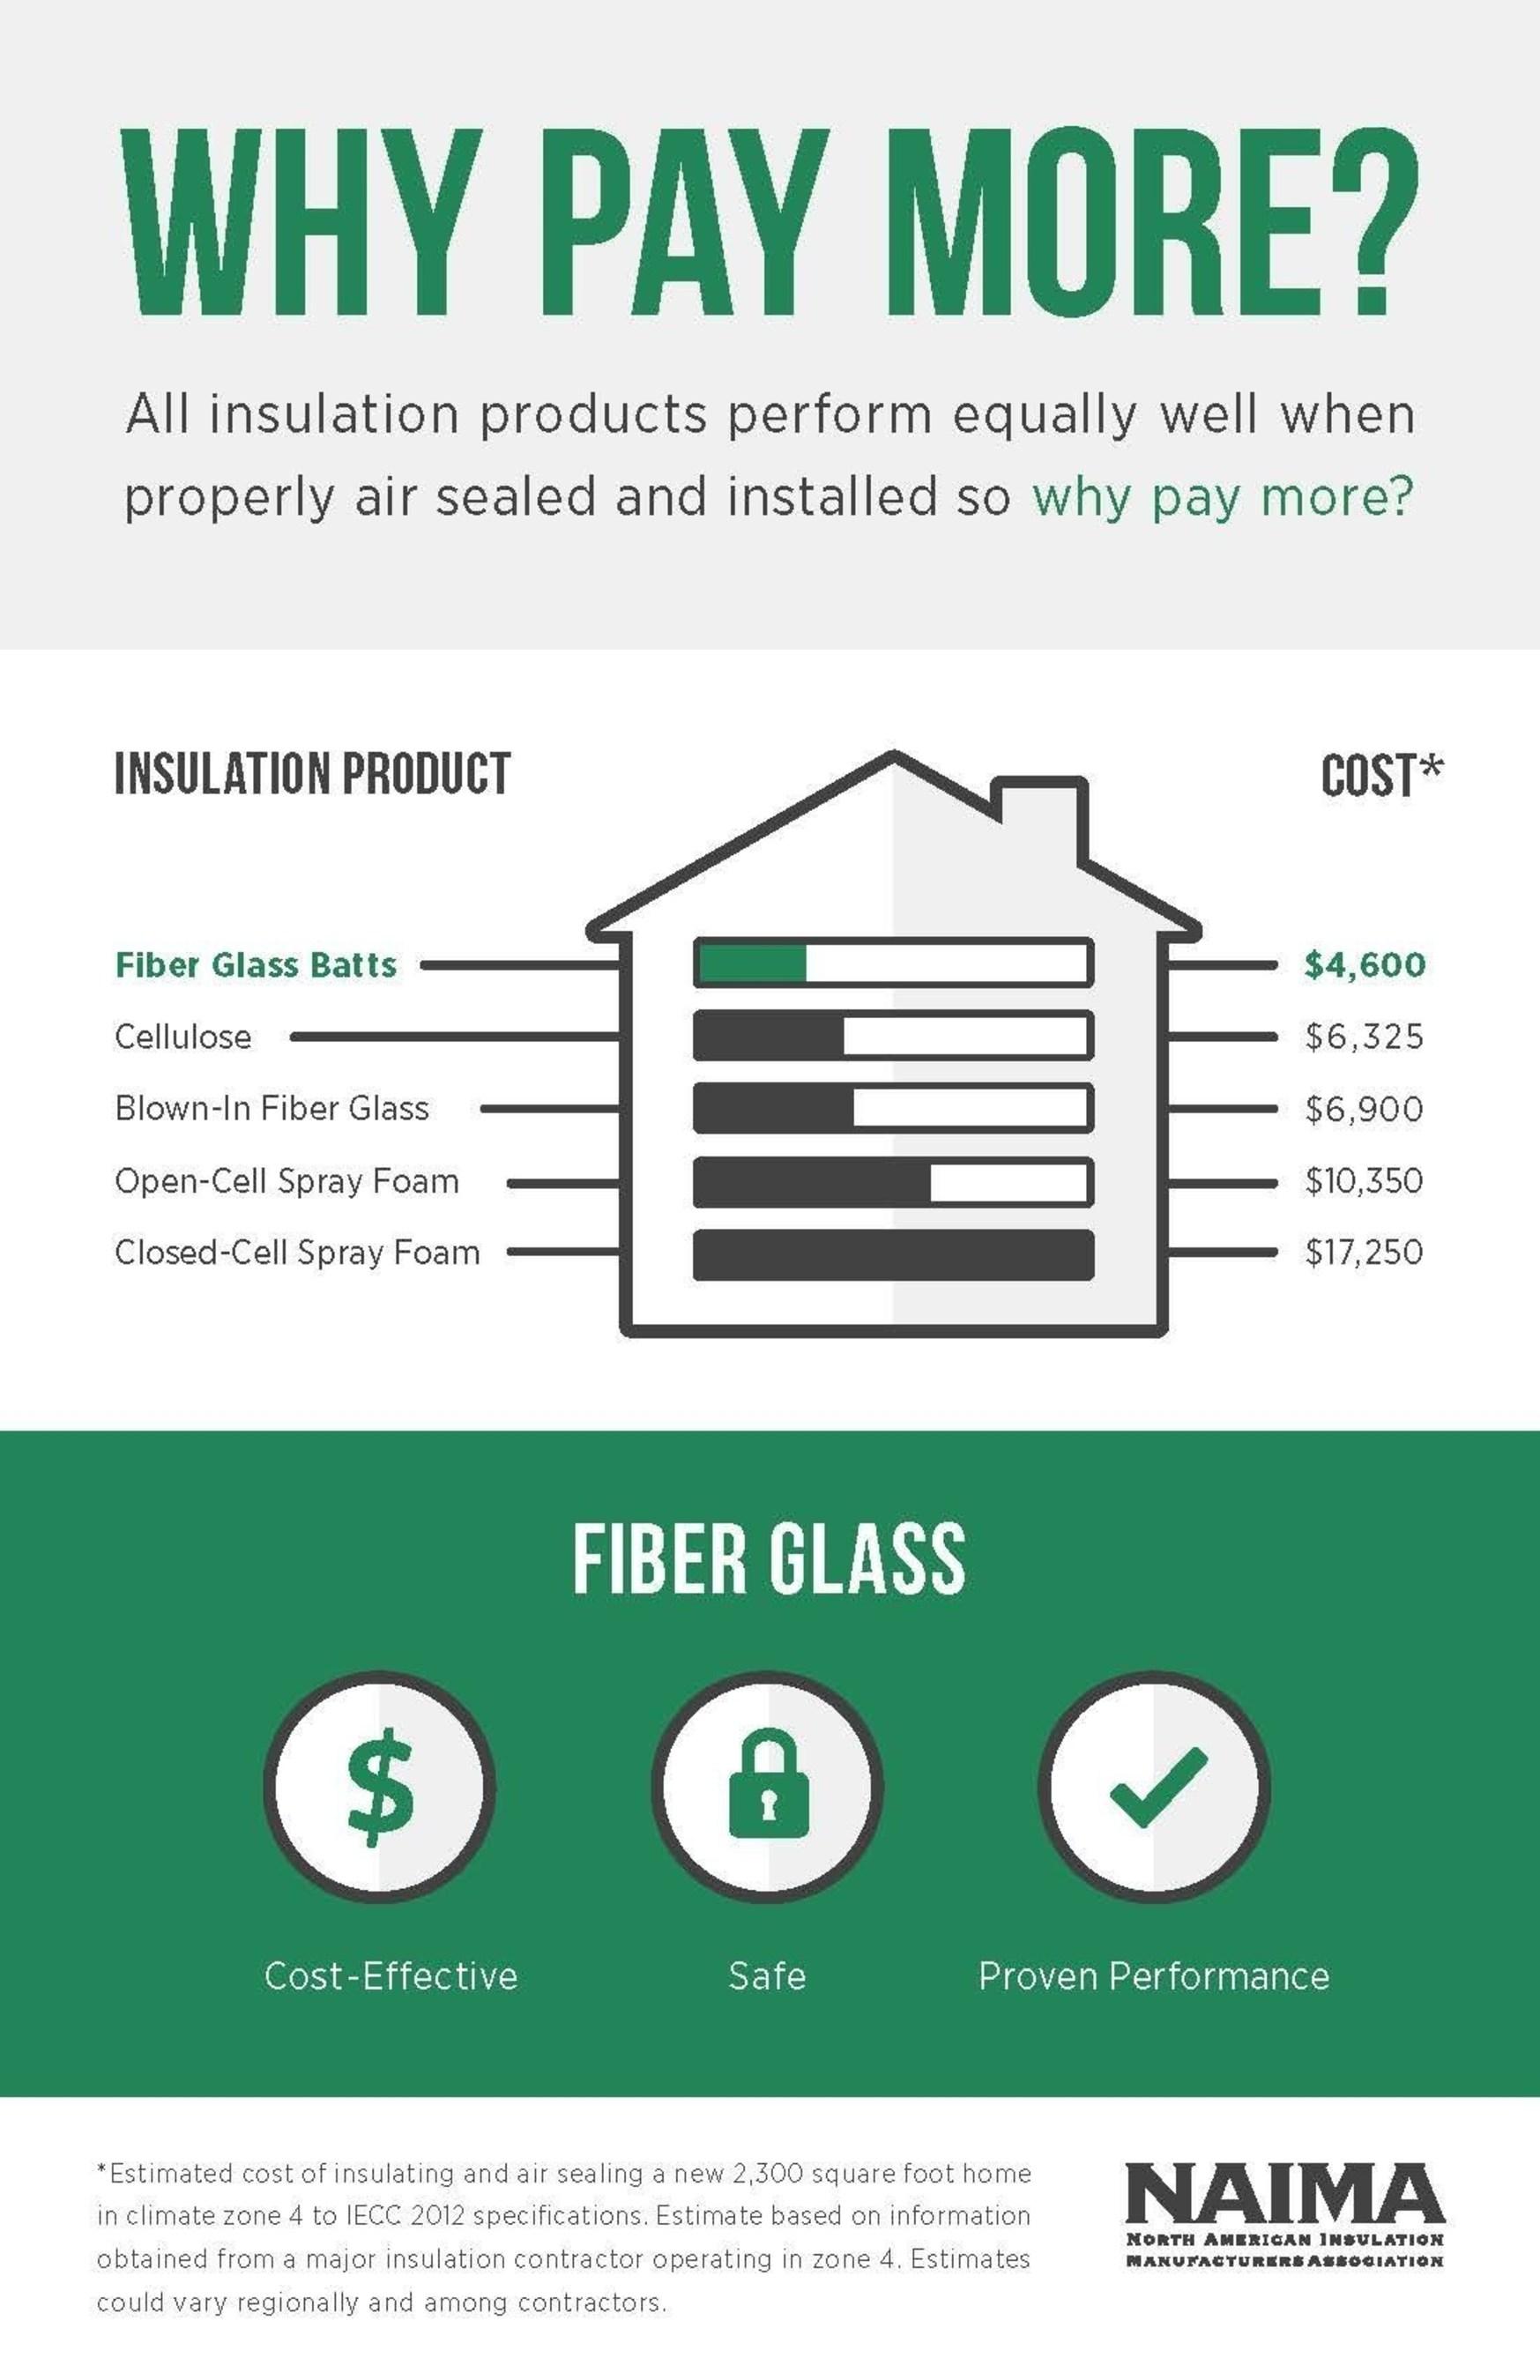 Green Fiber Cellulose Insulation : green, fiber, cellulose, insulation, Report:, Insulation, Materials, Perform, Equally, Properly, Installed